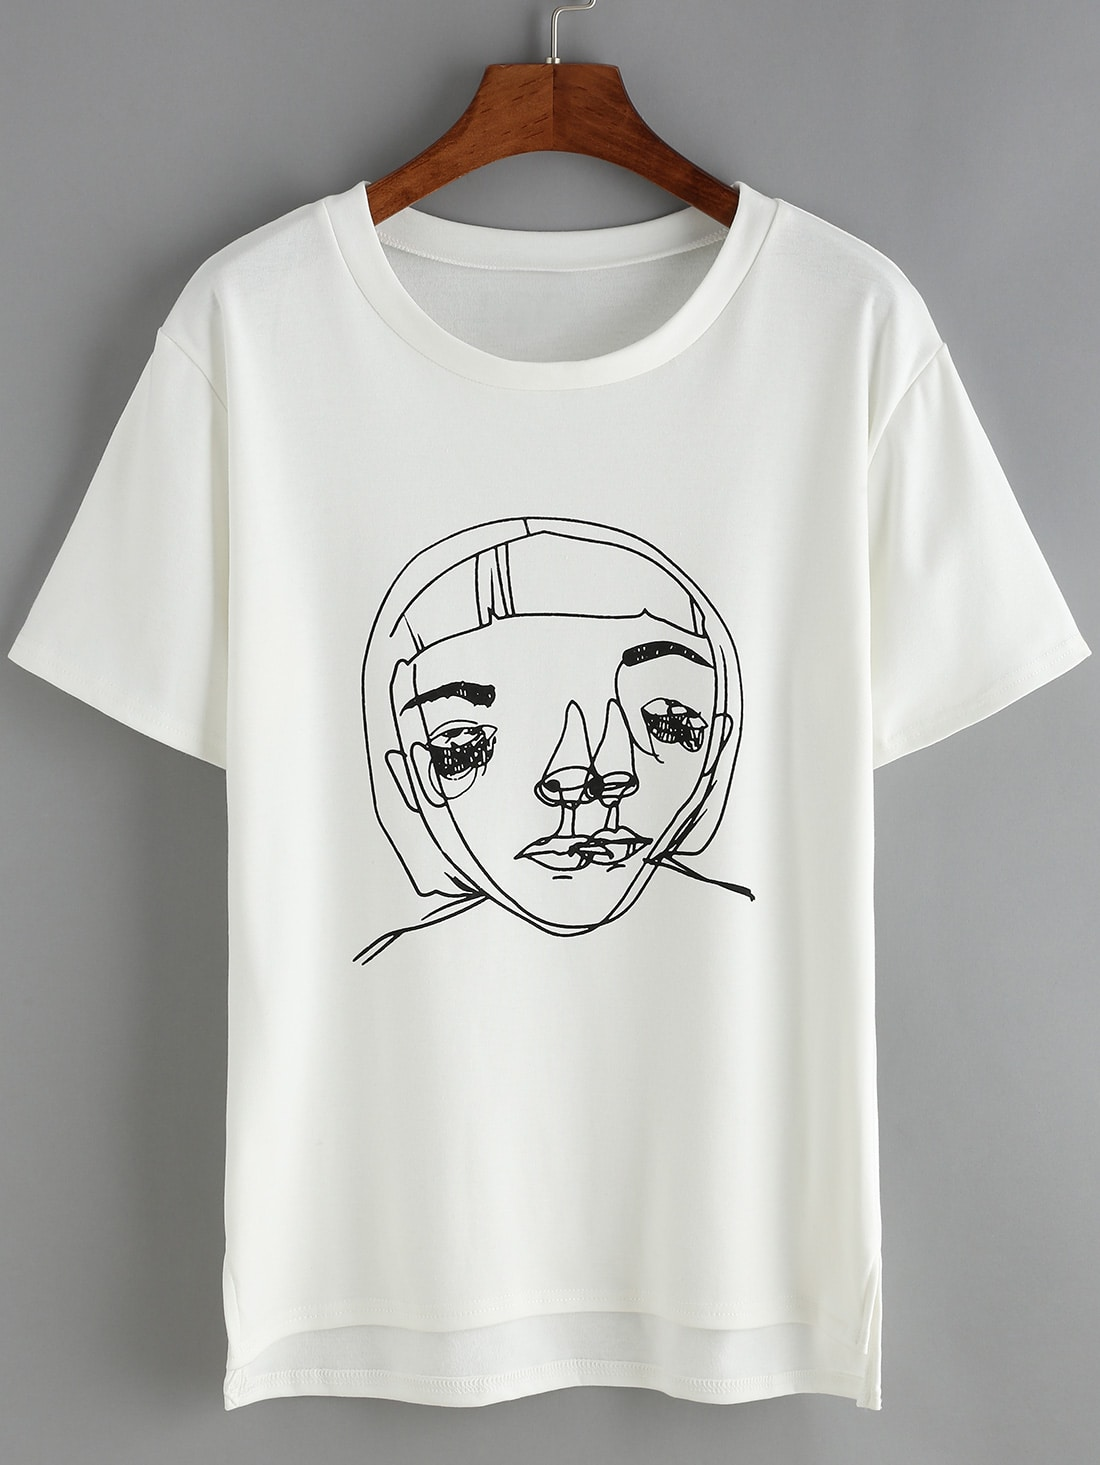 Shein official online shop